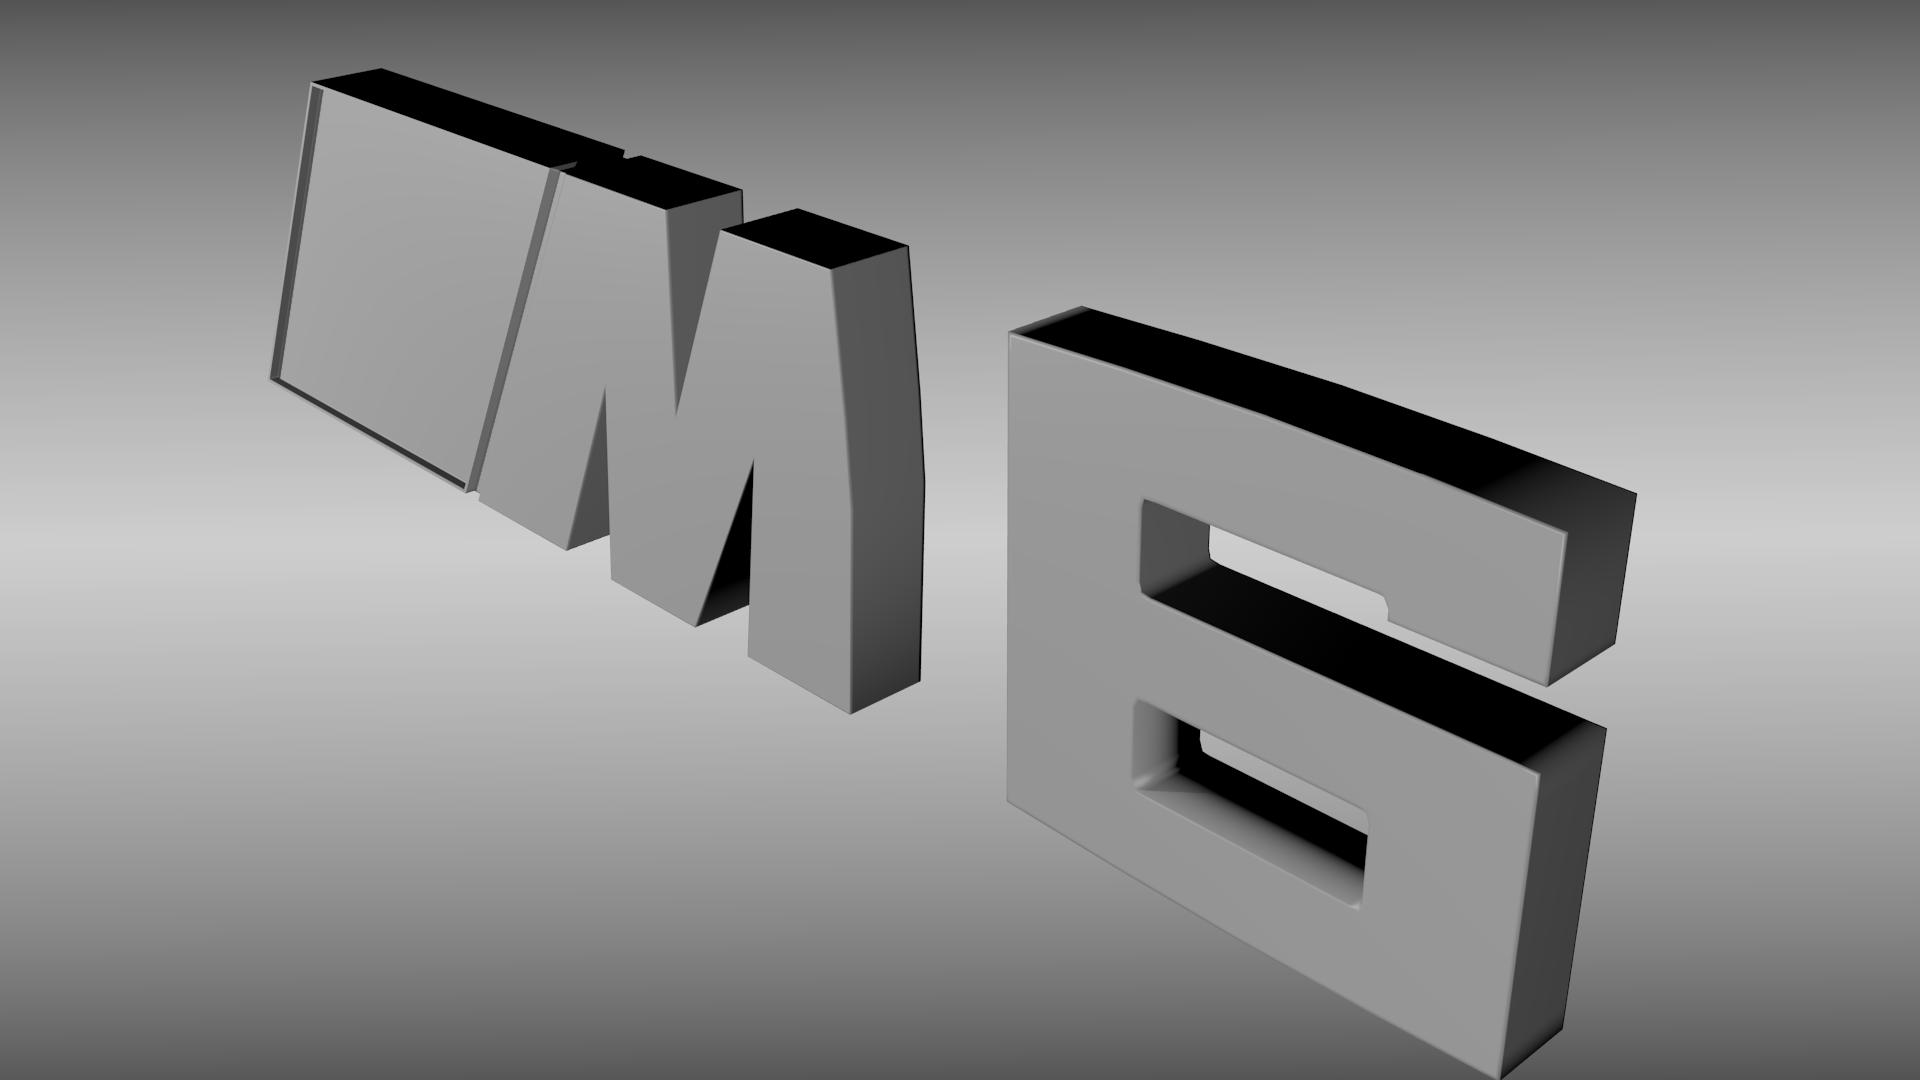 bmw m6 logo 3d model obj blend cgtradercom